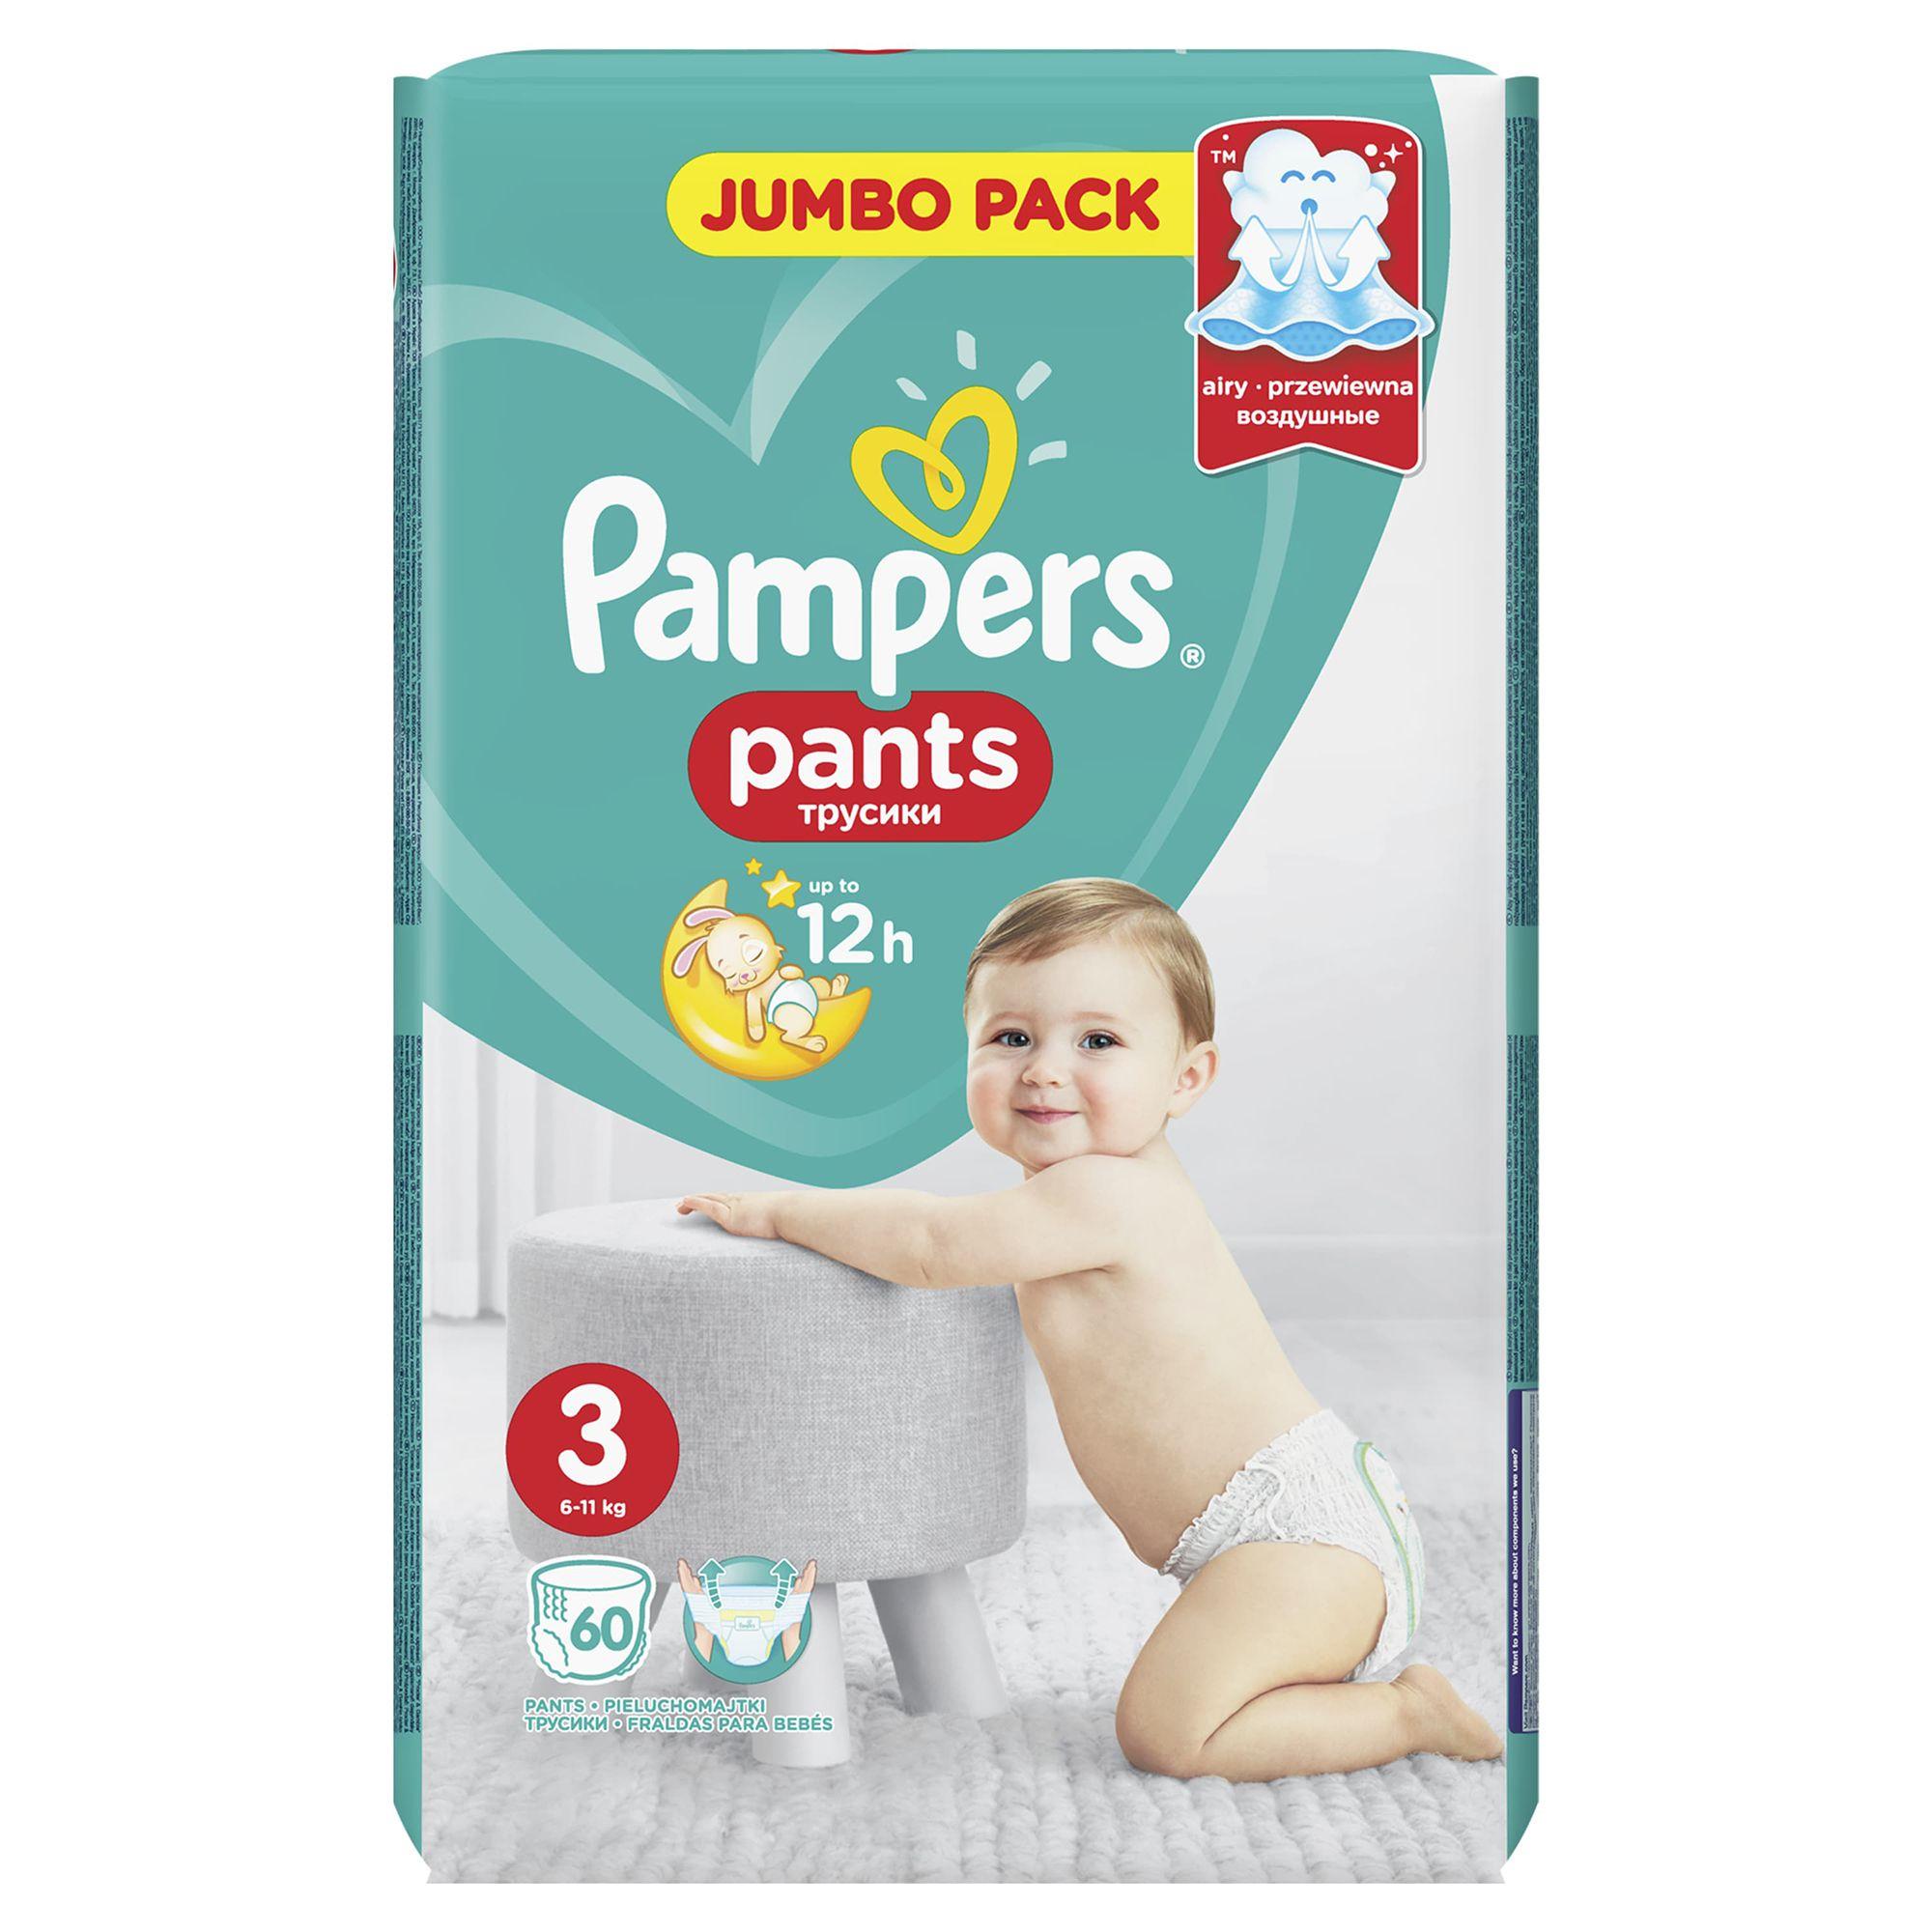 Памперс гащи - pampers pants 3 /60бр./-голям пакет